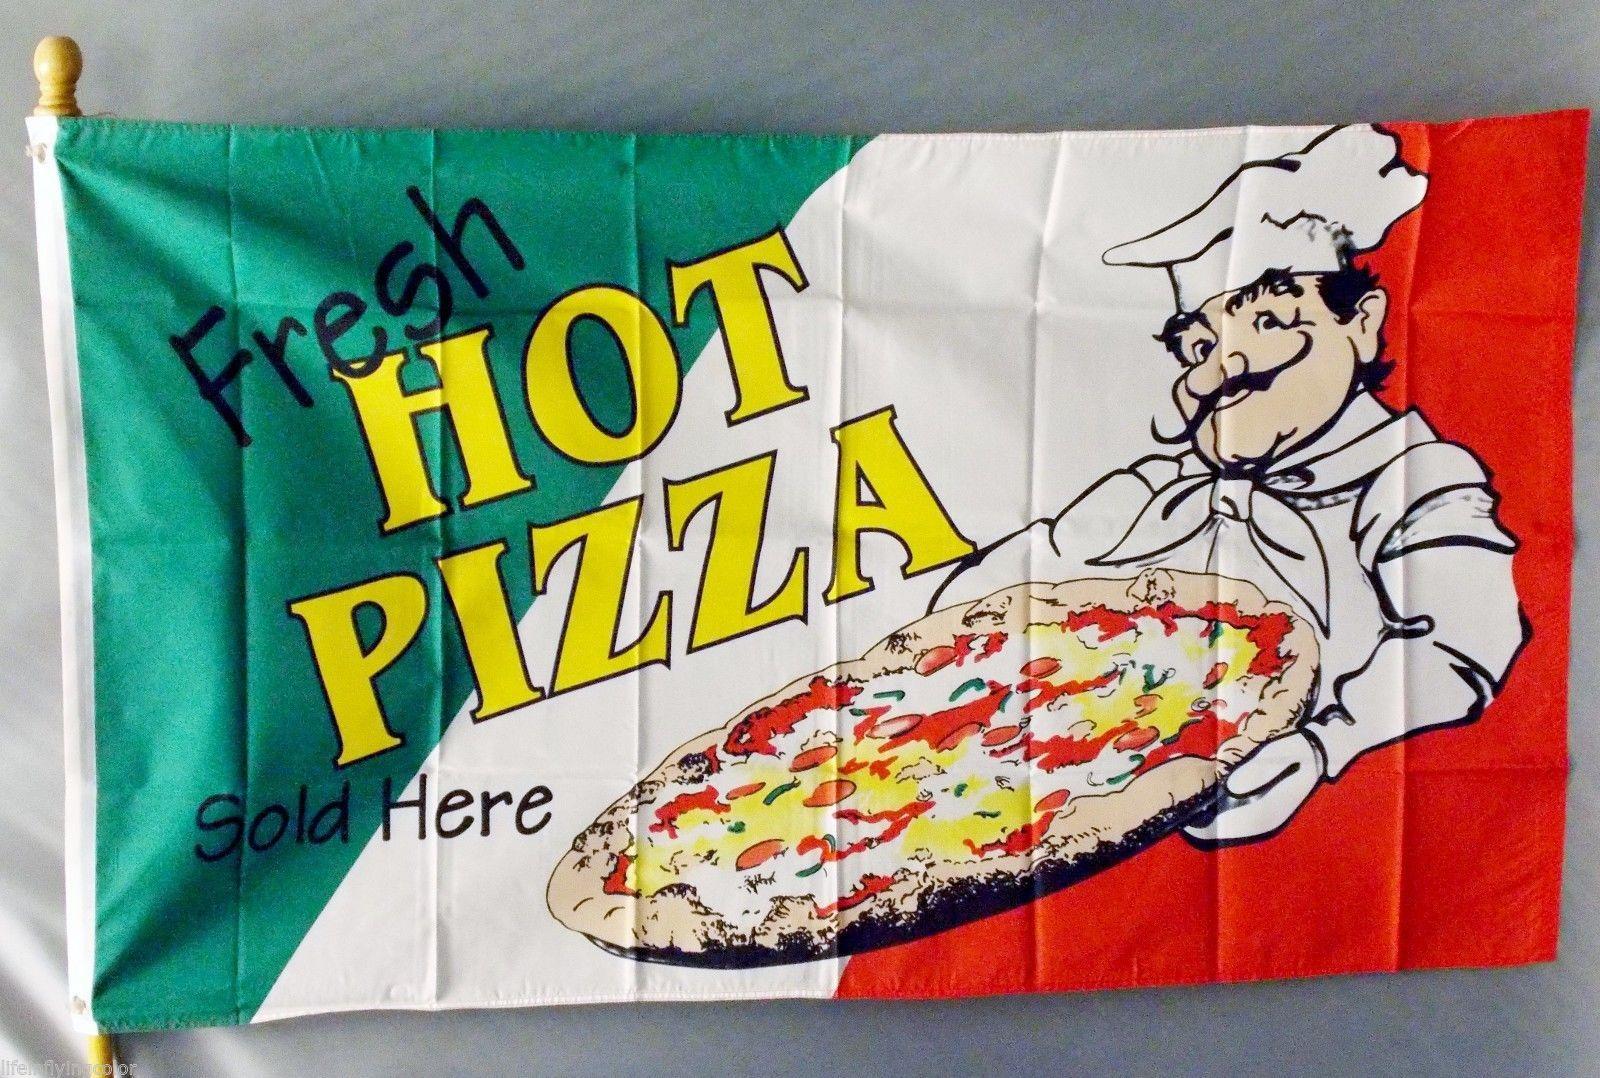 FRESH HOT PIZZA 3X5' FLAG NEW 3'X5' ITALY ITALIAN BIG